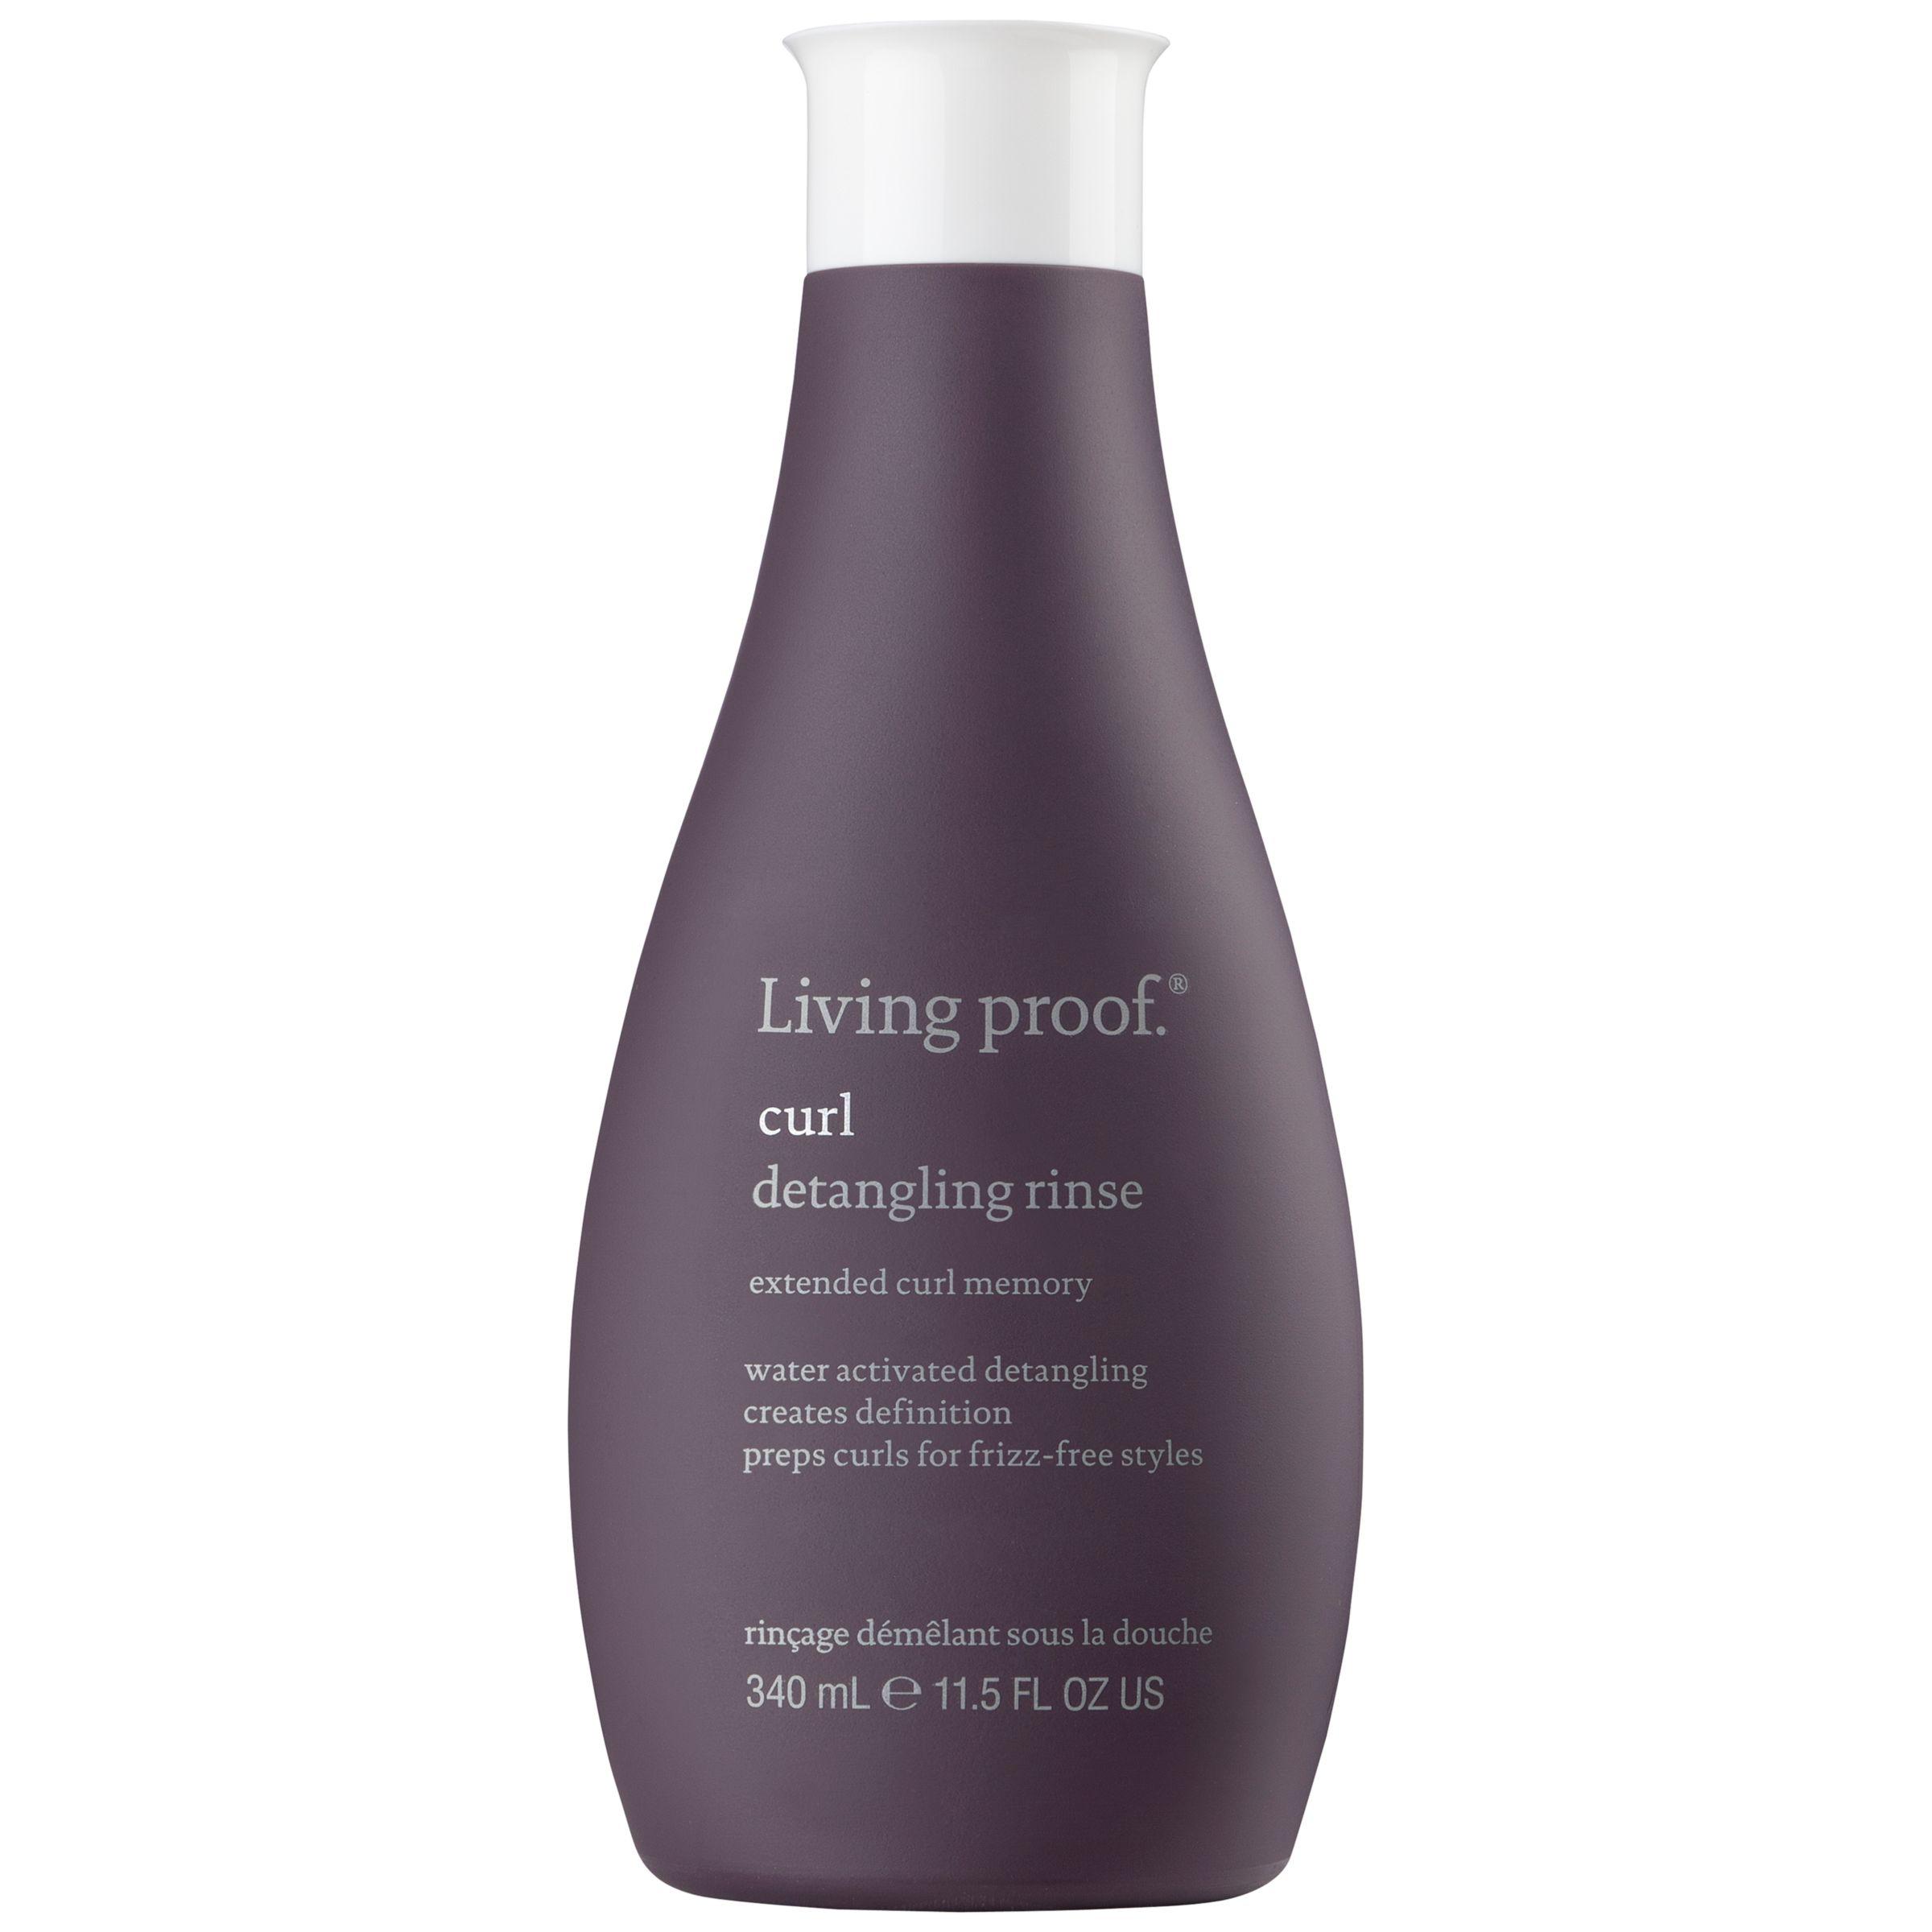 Living Proof Living Proof Curl Detangling Rinse, 340ml